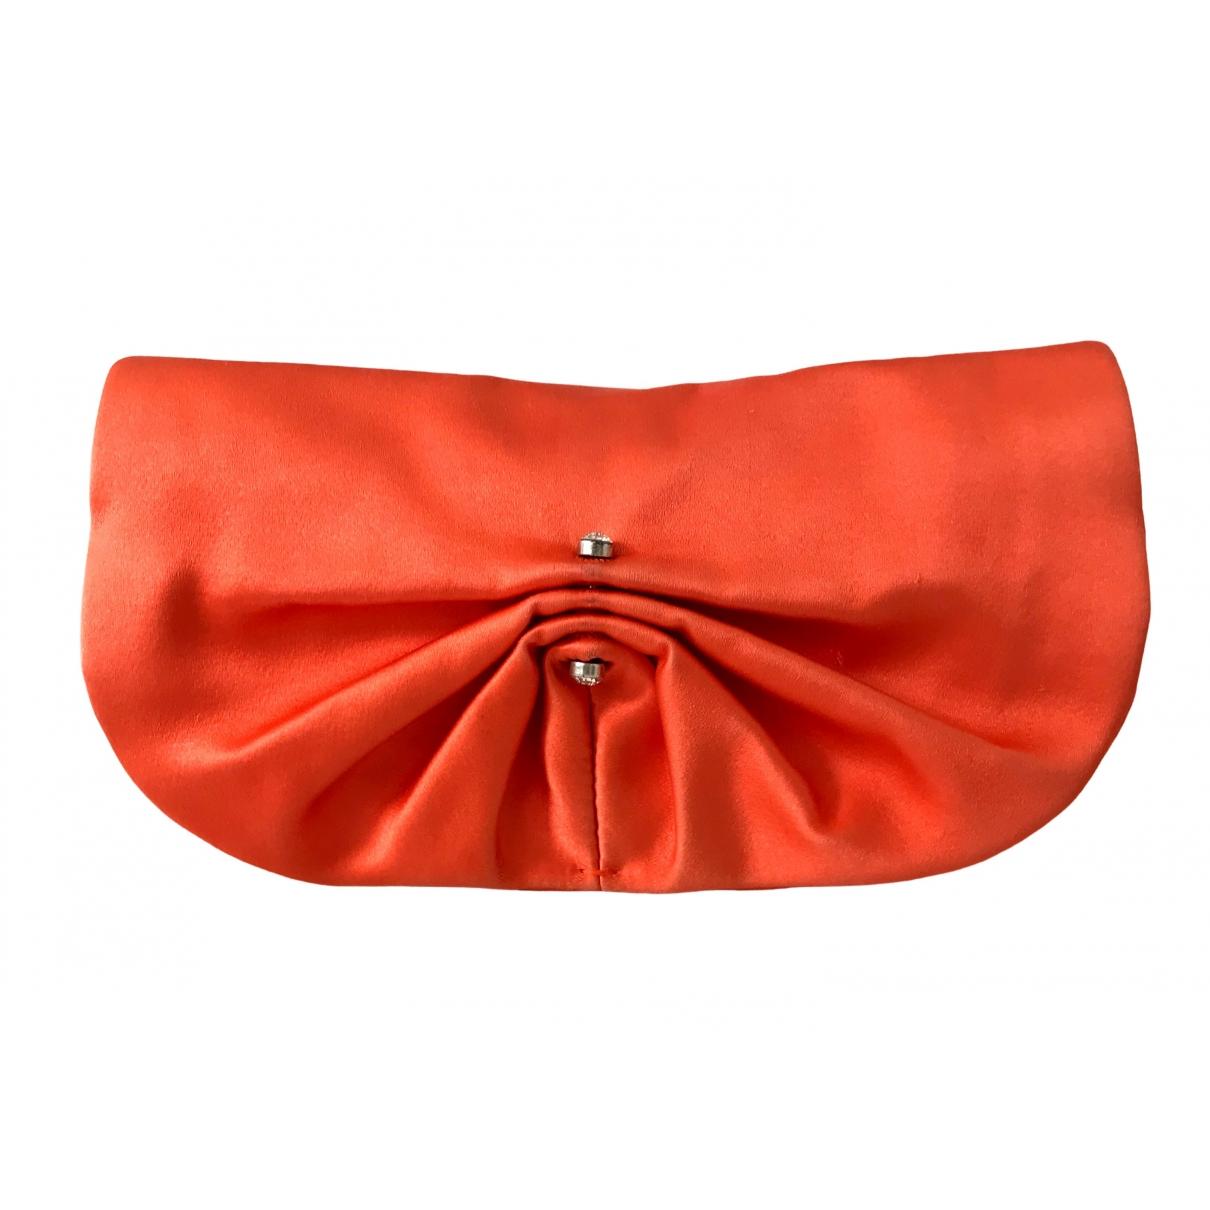 Yves Saint Laurent \N Silk Clutch bag for Women \N